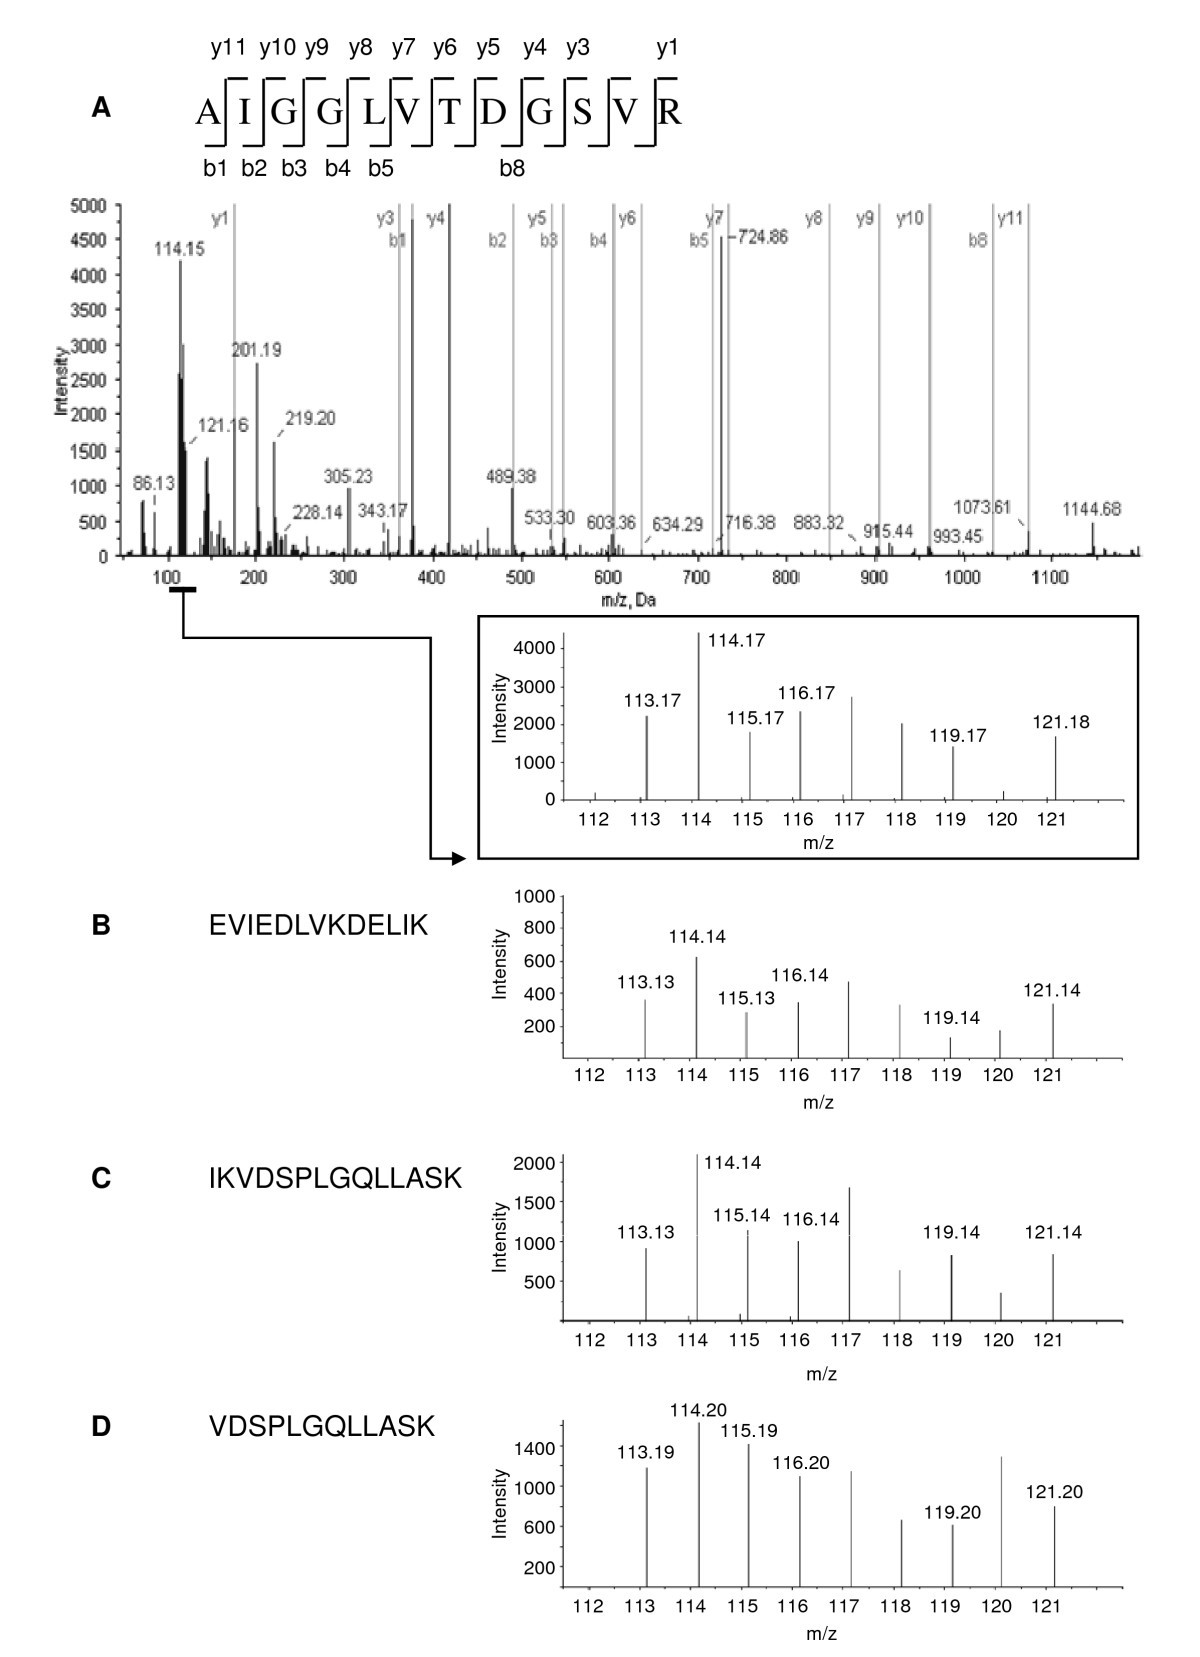 Proteomic Analysis Of The Marine Diatom Thalassiosira Pseudonana Tc 90 Engine Compartment Diagram Figure 2